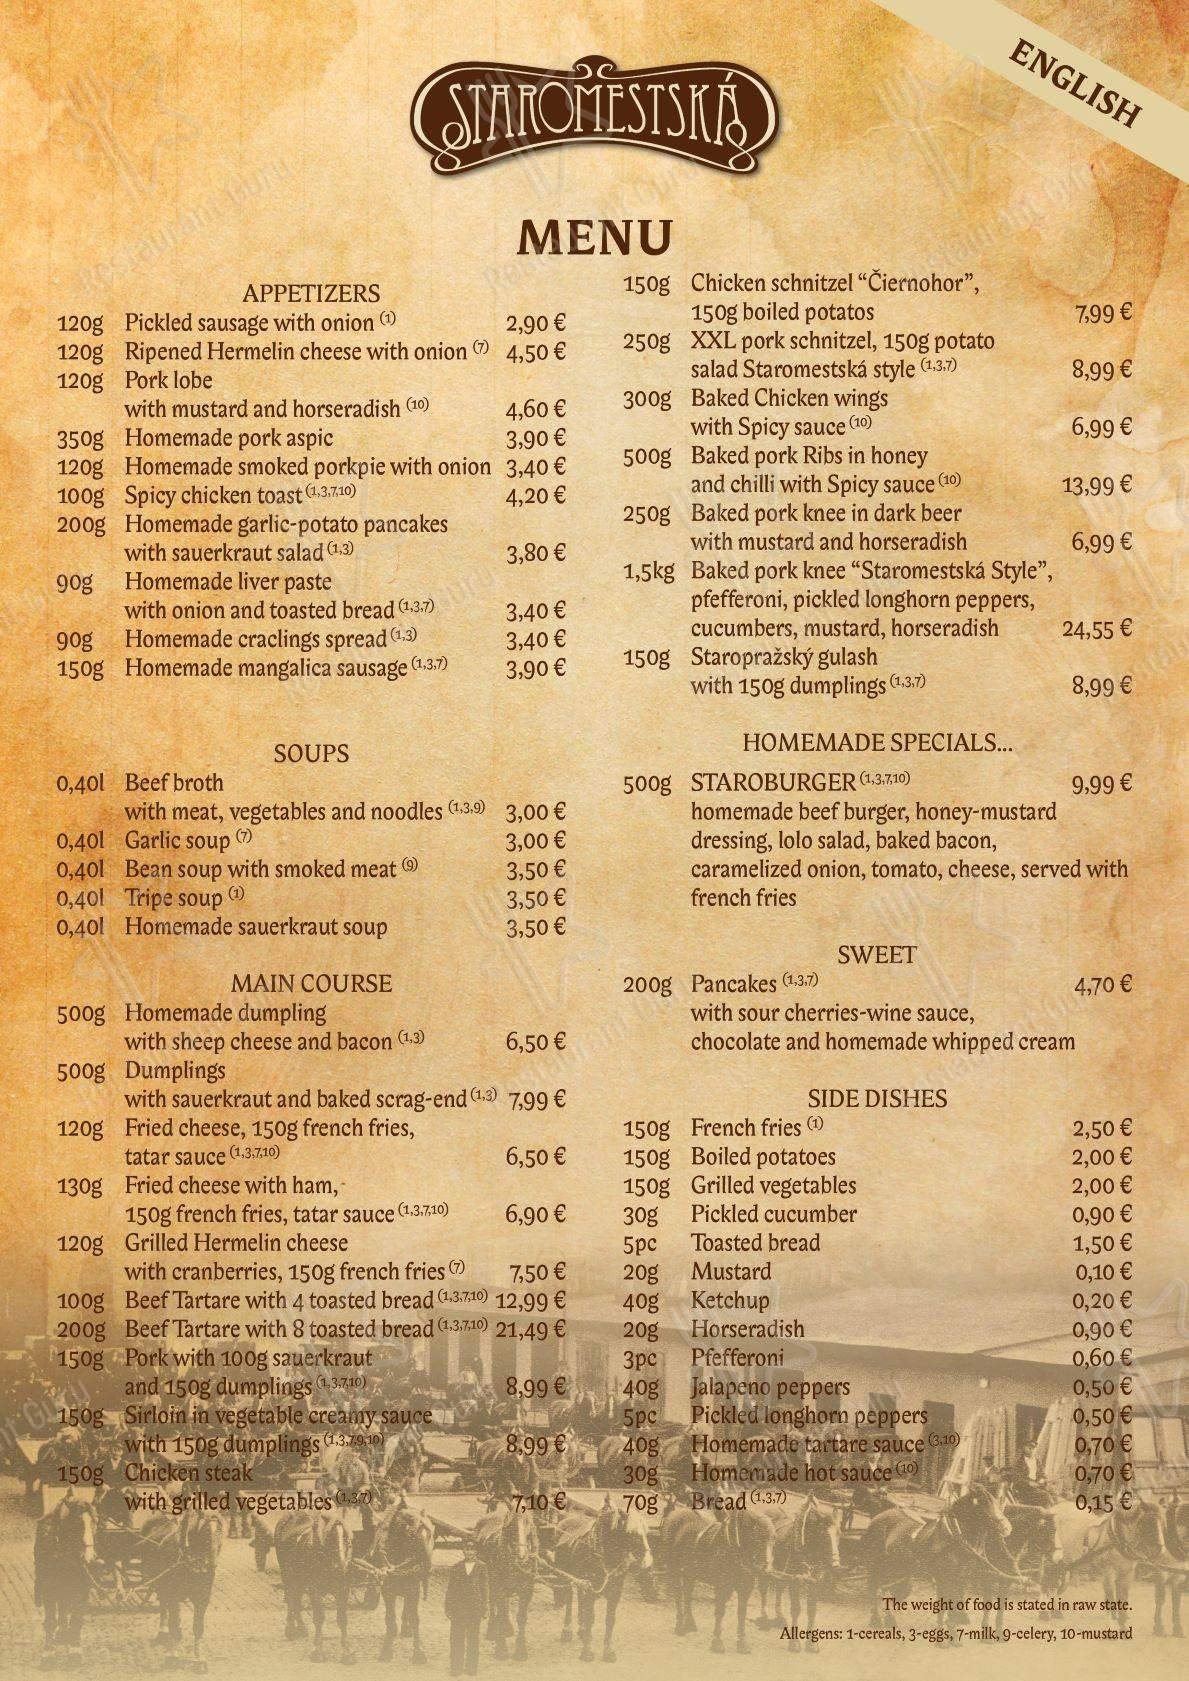 Menu pour Staromestská Piváreň pub et bar